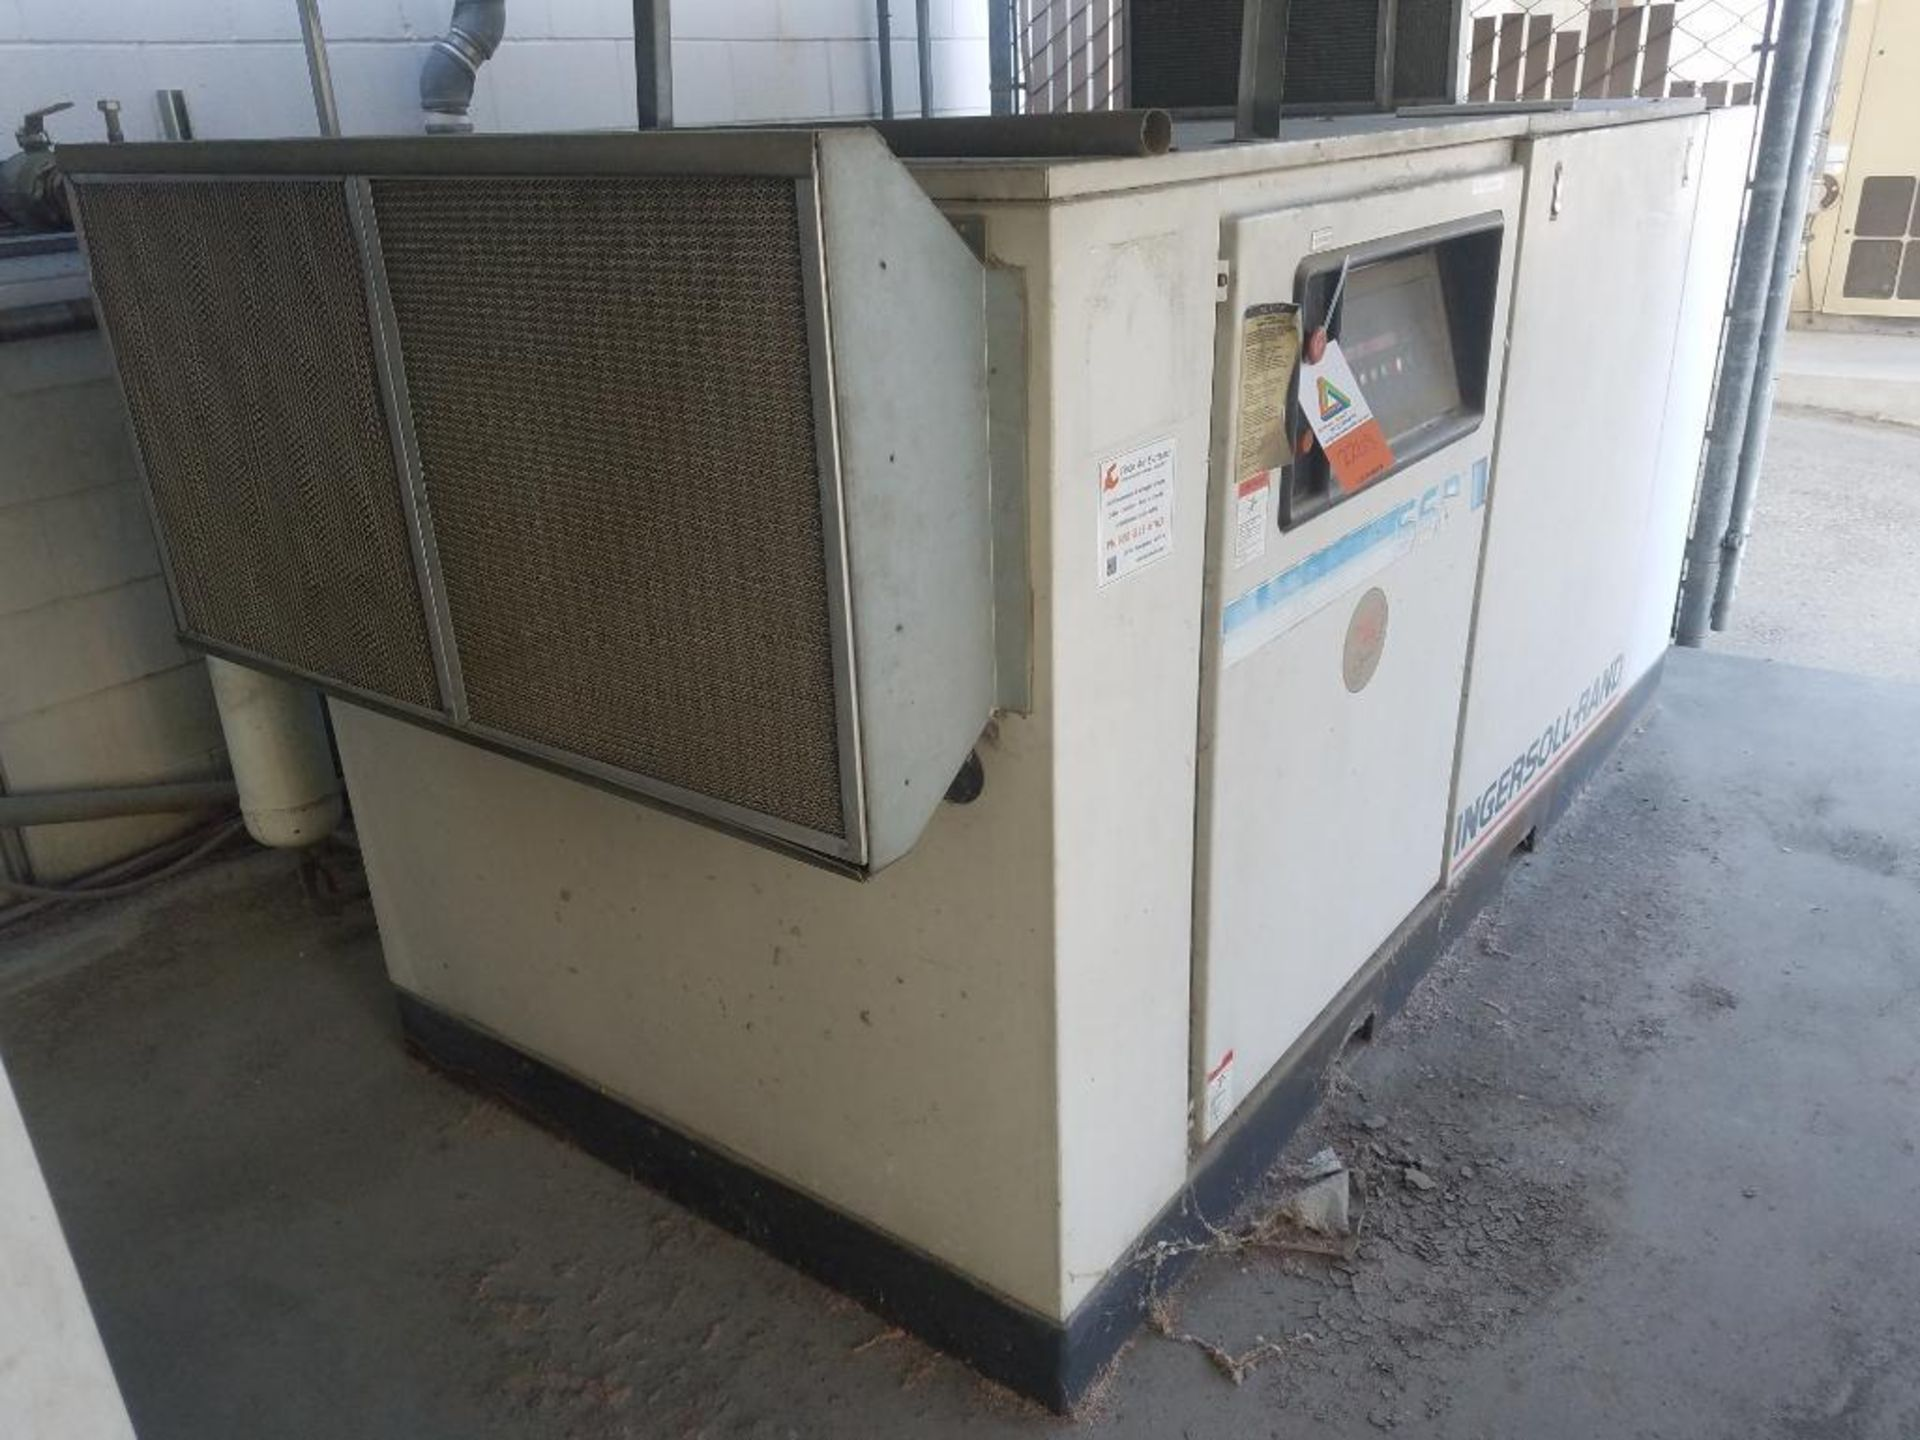 Ingersoll Rand rotary screw air compressor, 100 hp